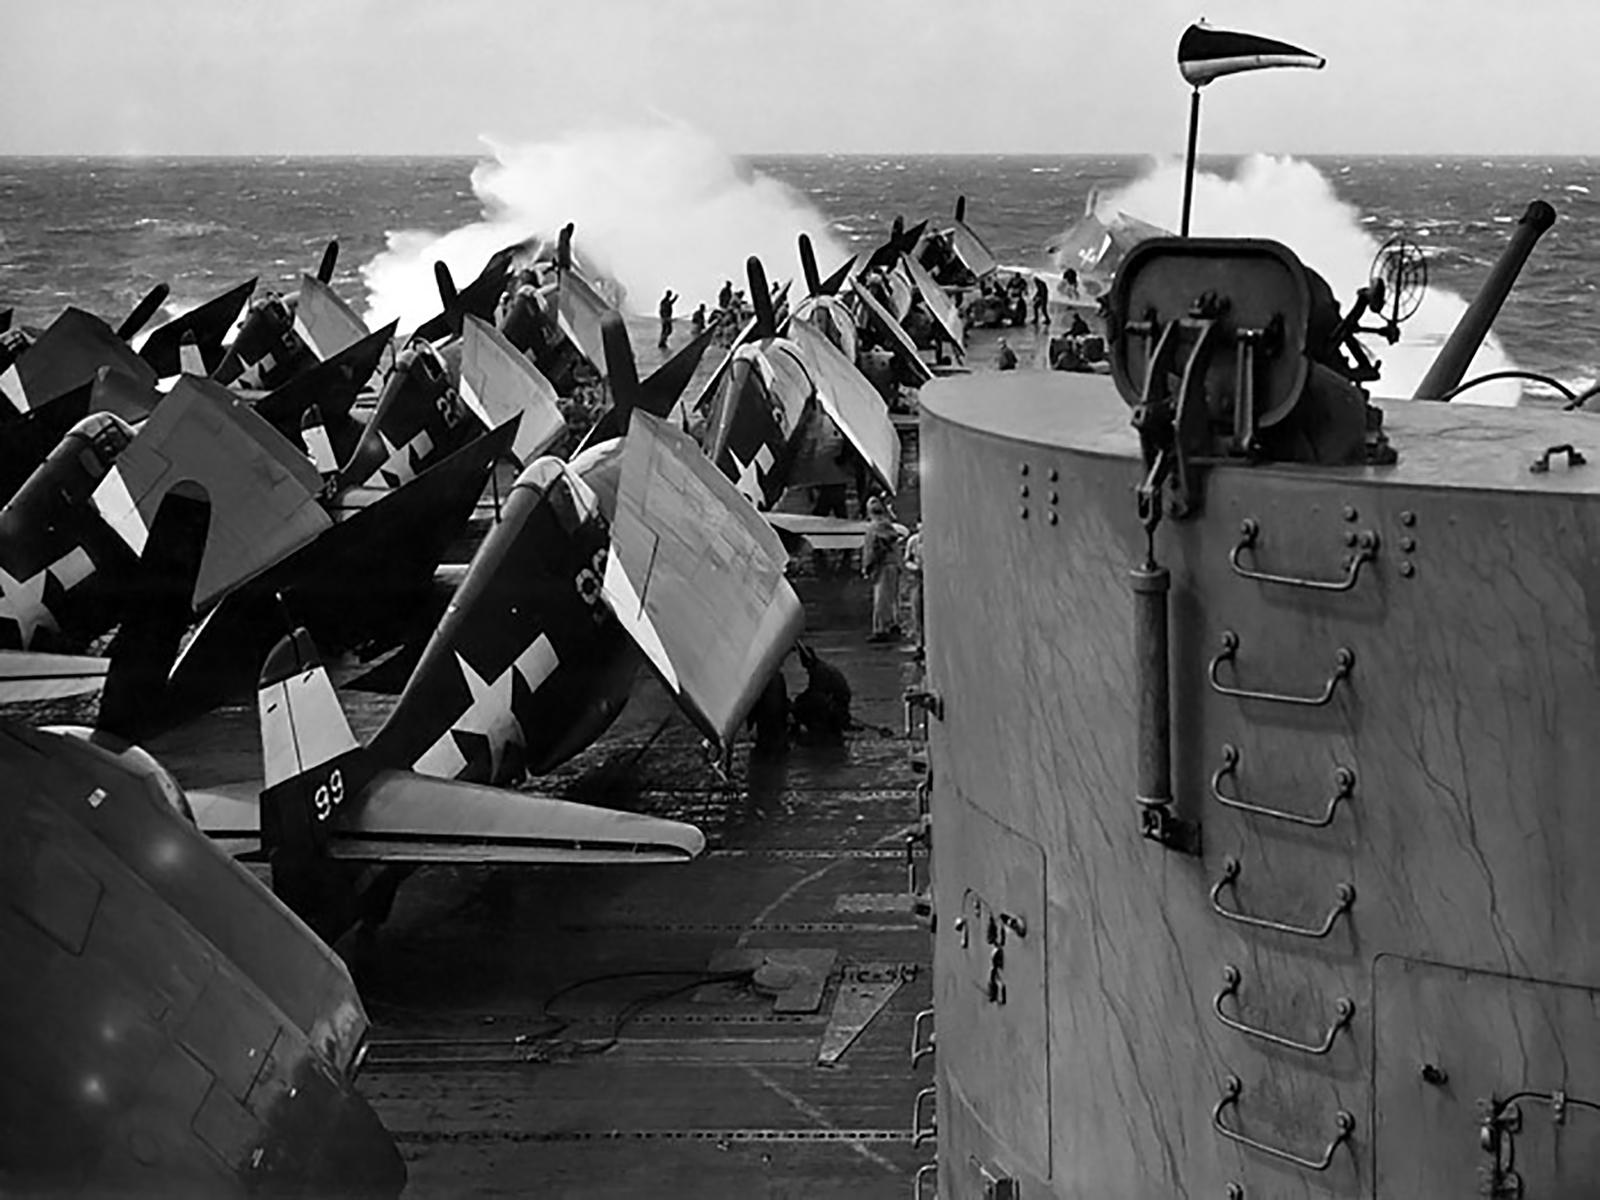 Grumman F6F 5 Hellcat VF 94 White 99 aboard CV 16 USS Lexington 14th Feb 1945 01